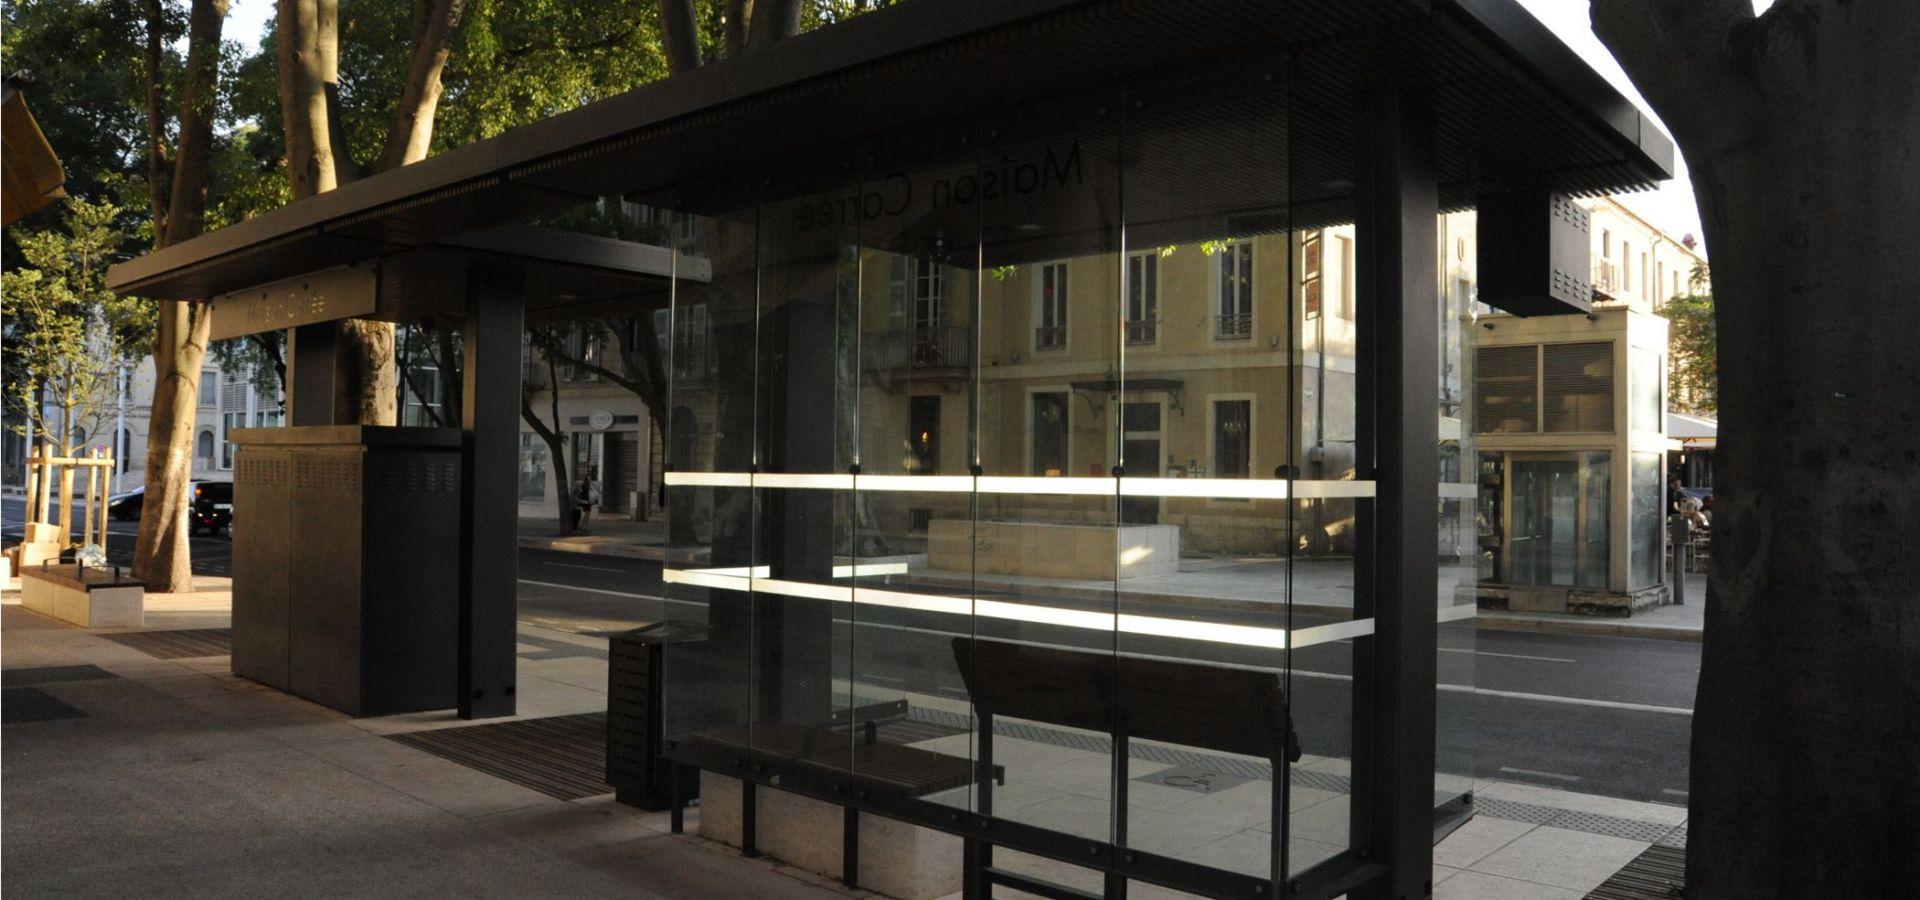 BHNS NIMES abris voyageurs, abri bus METALCO fabricant mobilier urbain design